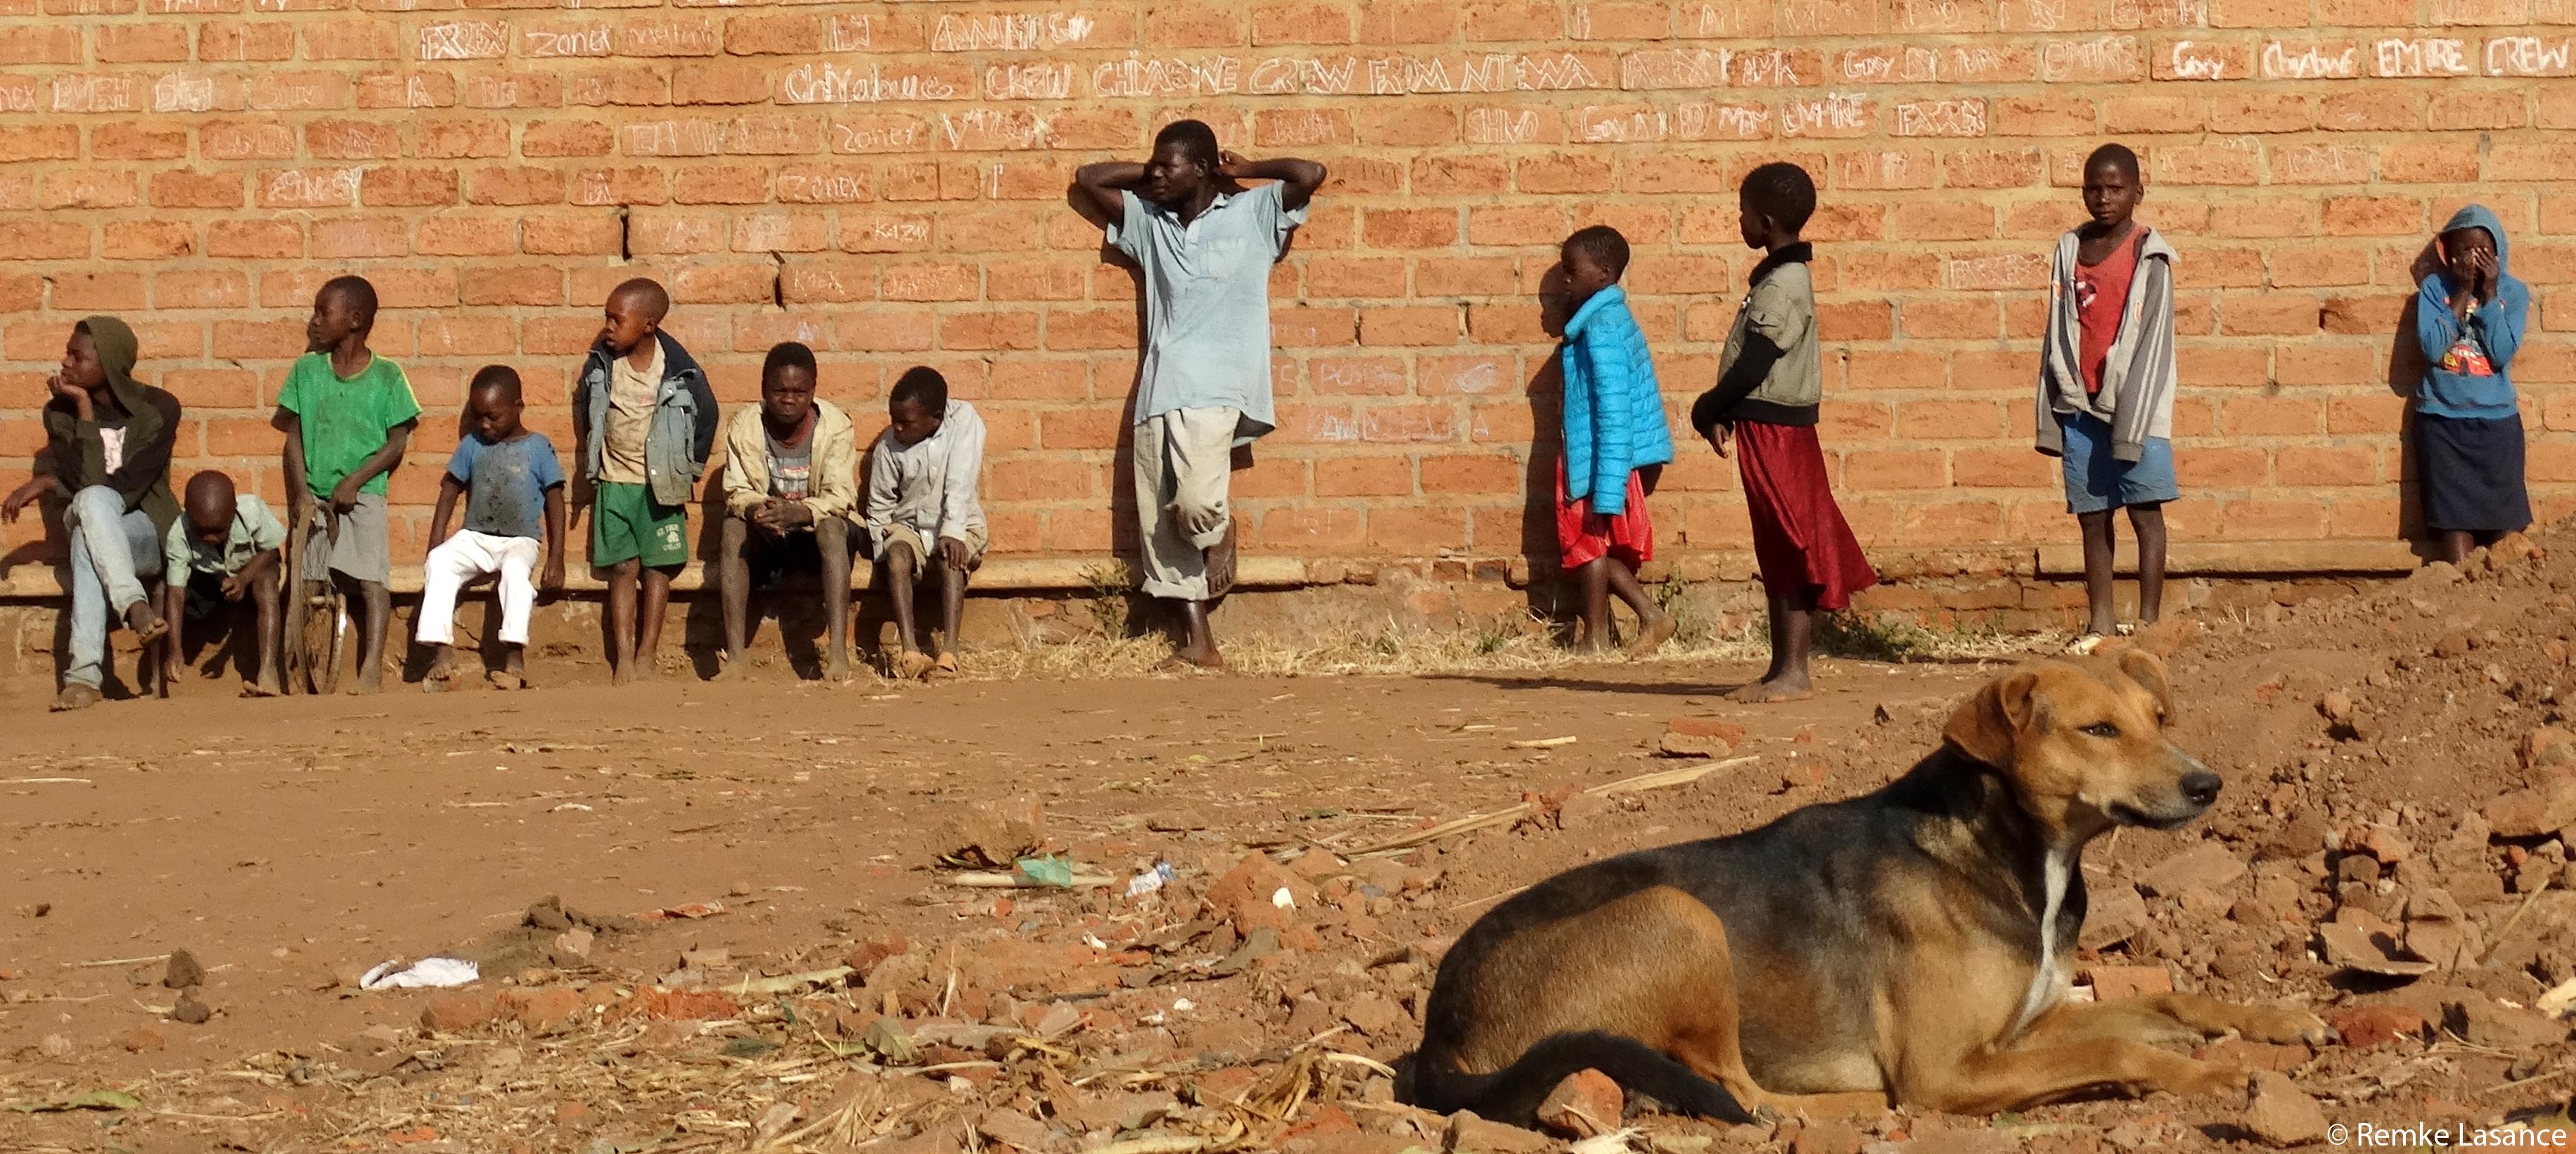 Die Armut in Malawi betrifft auch die Tiere